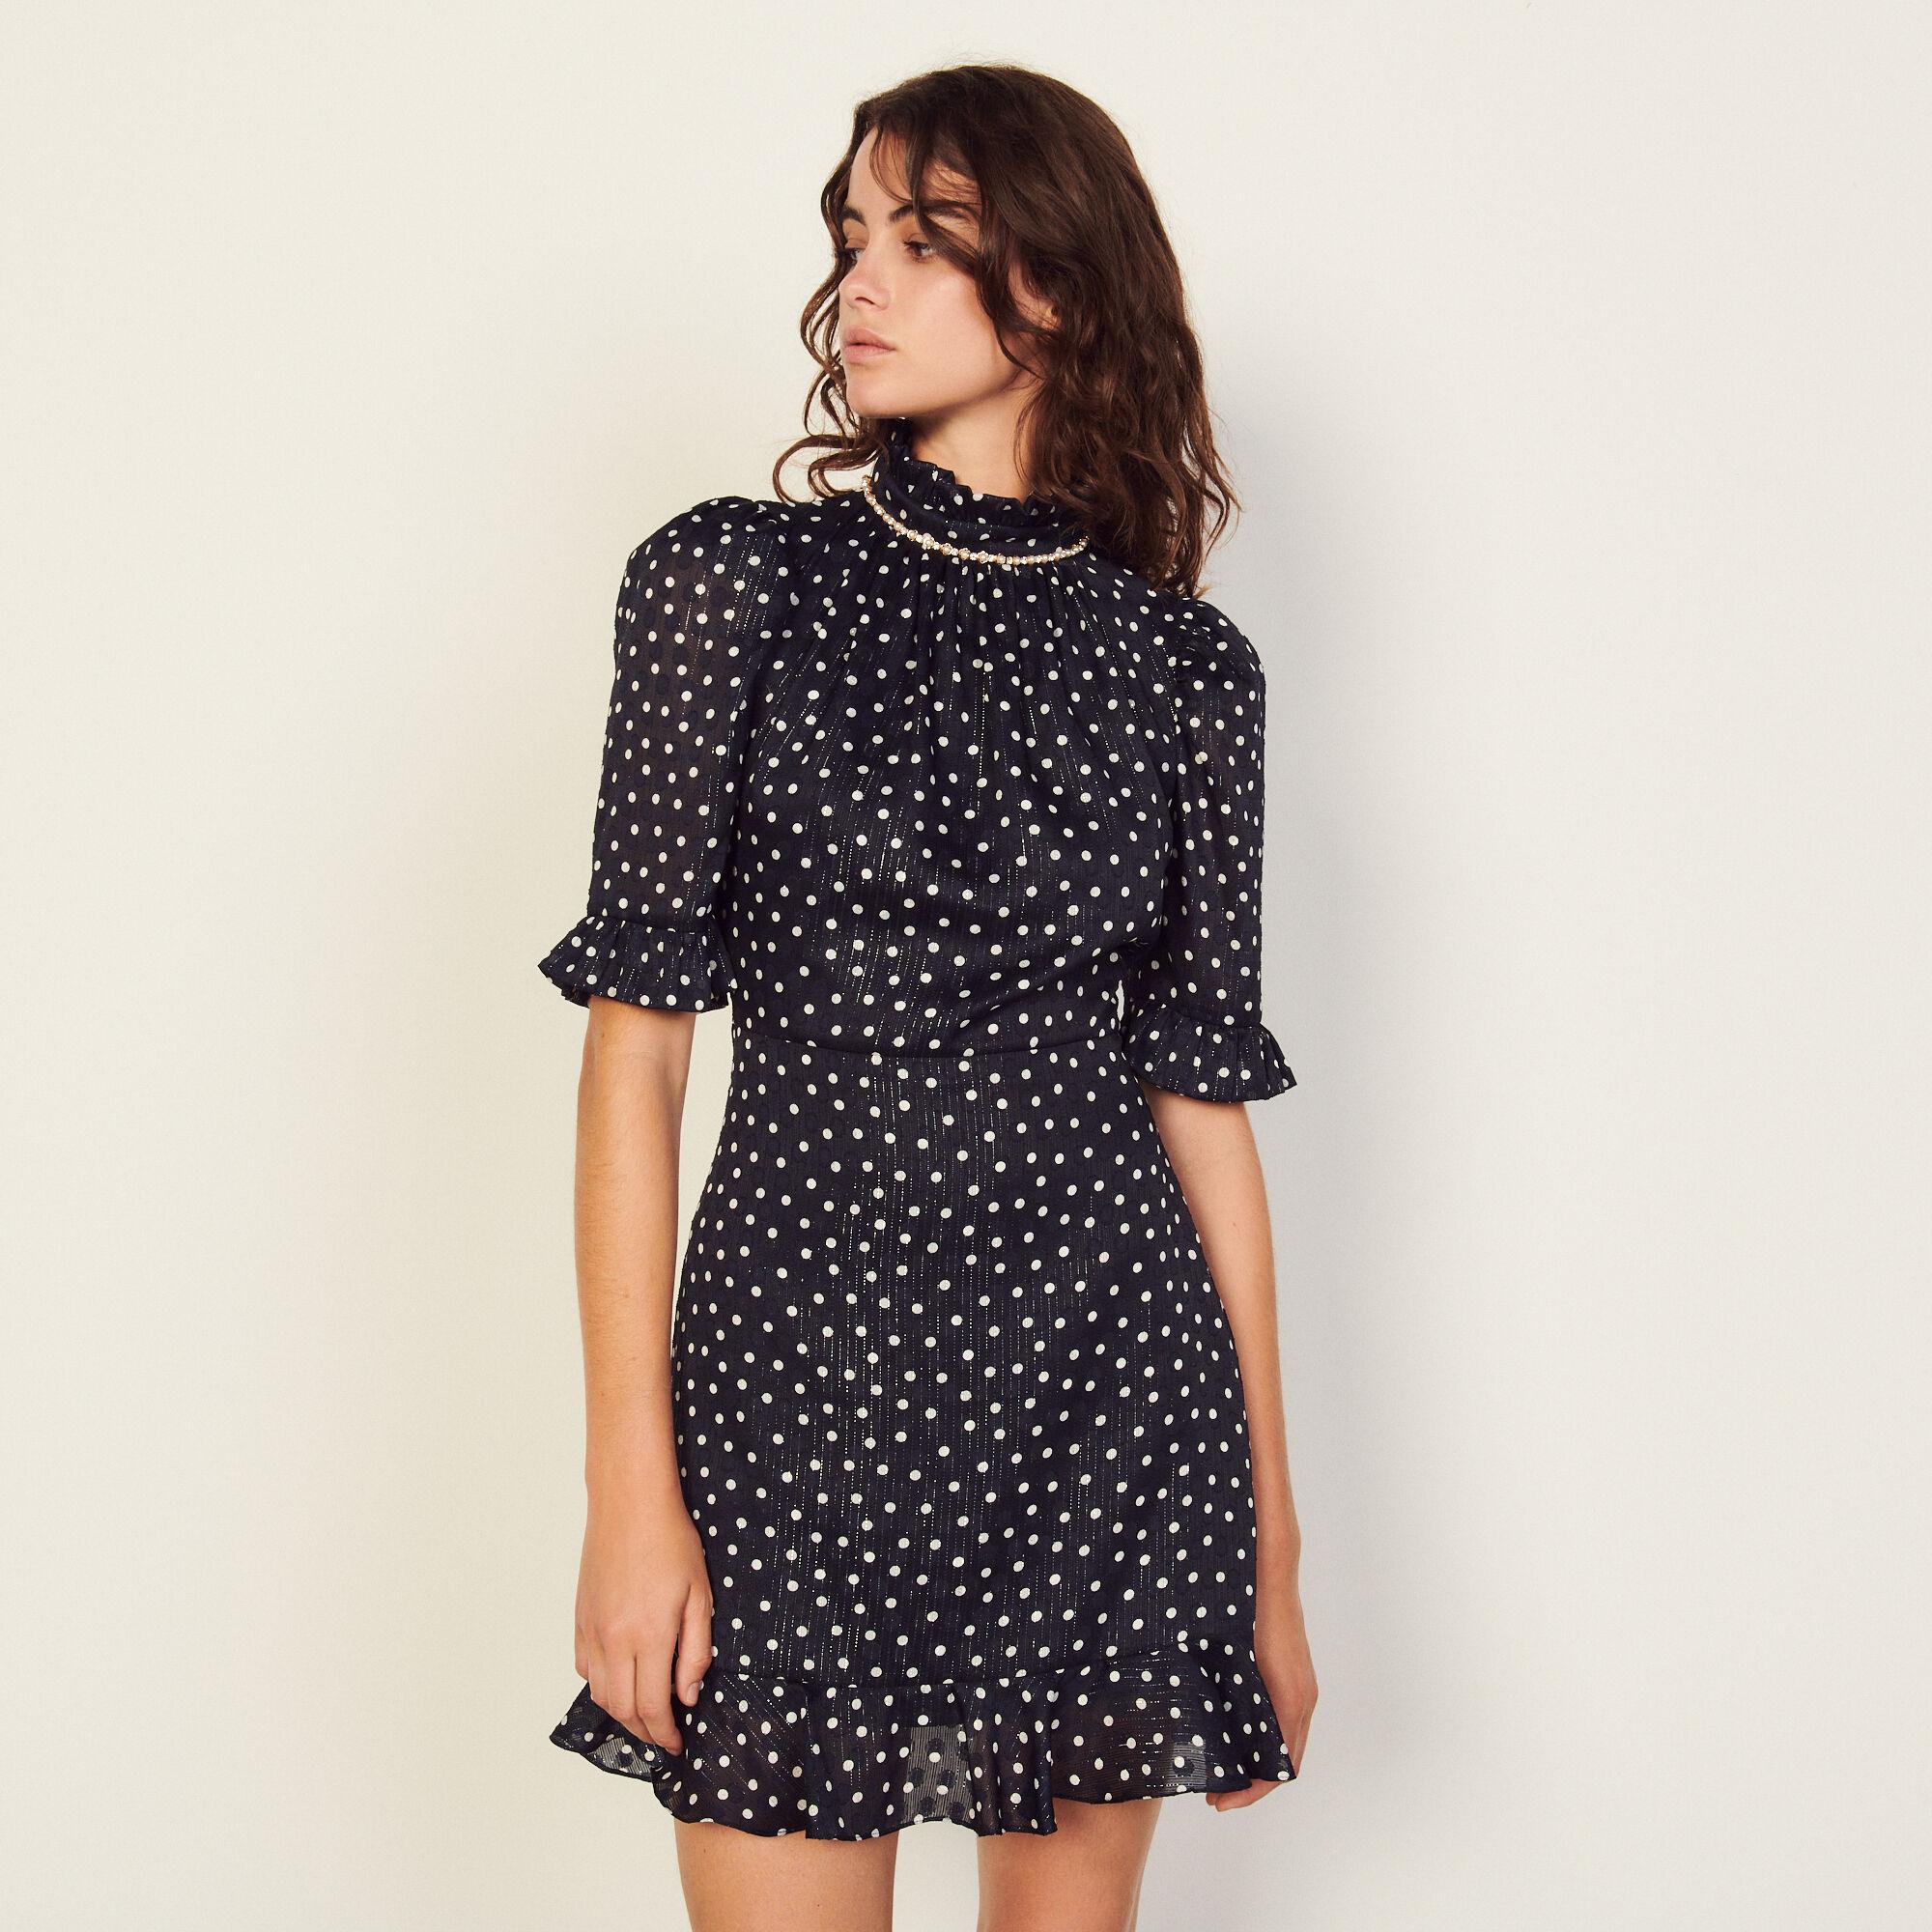 Sandro Short polka dot dress with jewels